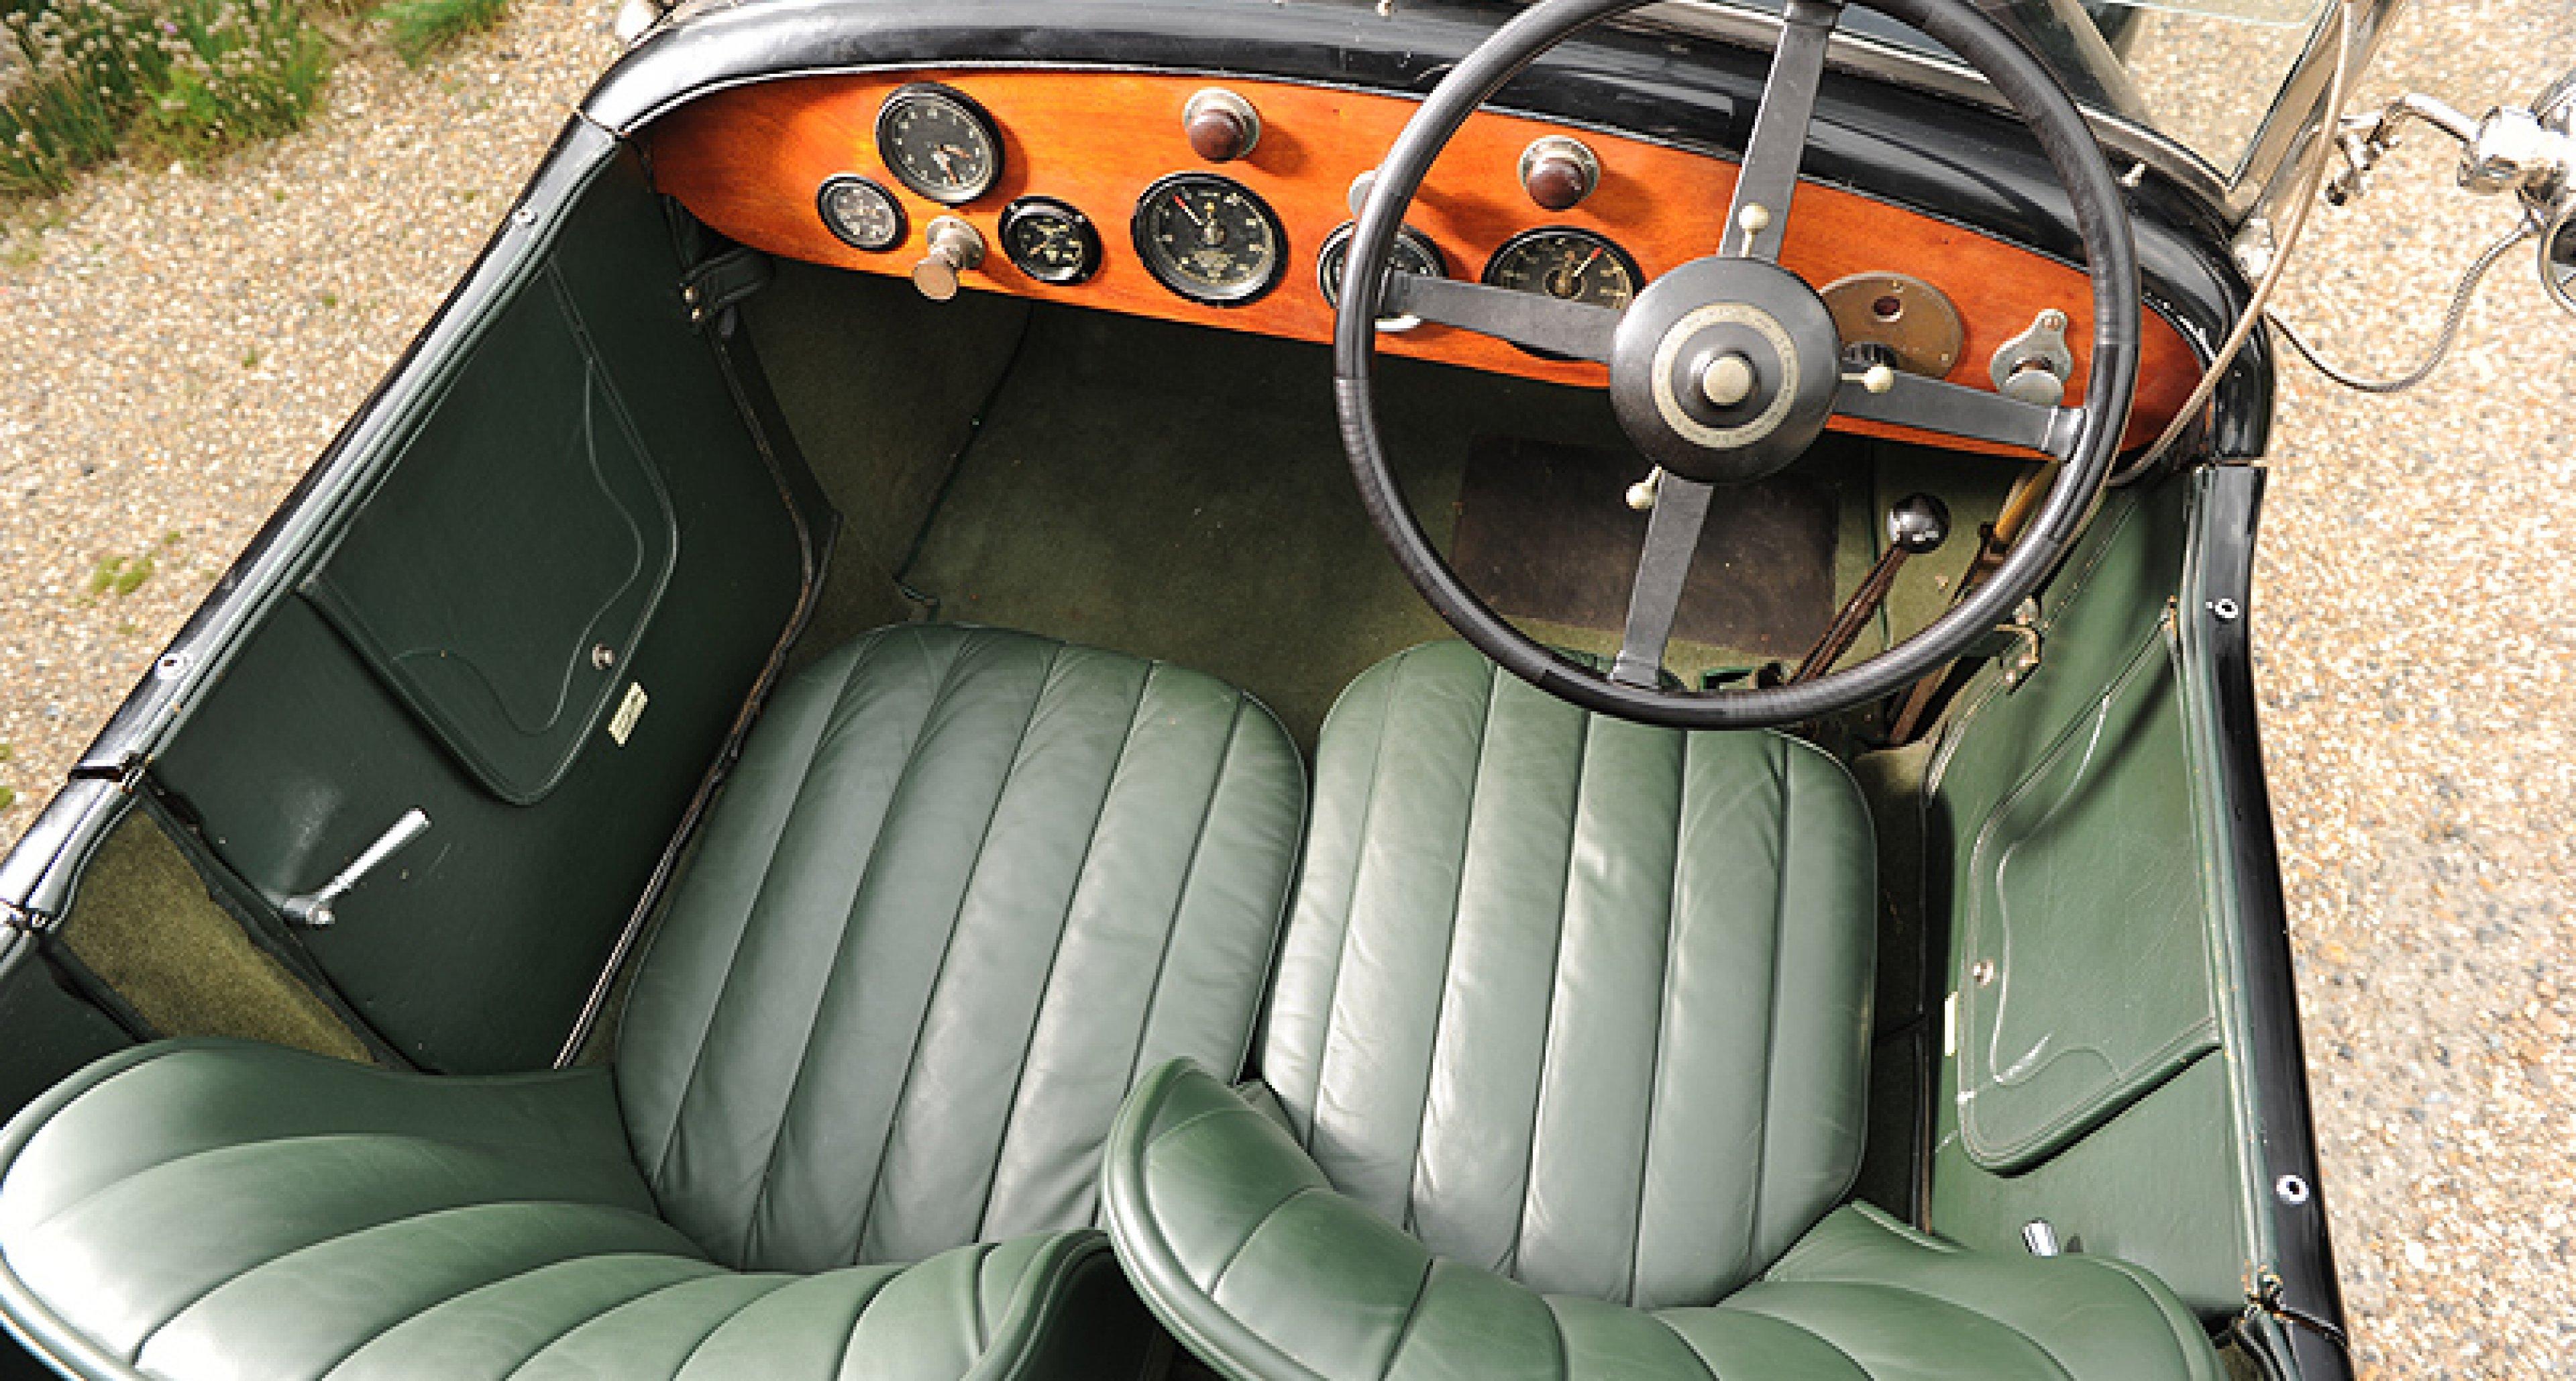 Original VDP-bodied, matching no.s Bentley 6½ Litre to star in Bonhams Quail Lodge sale